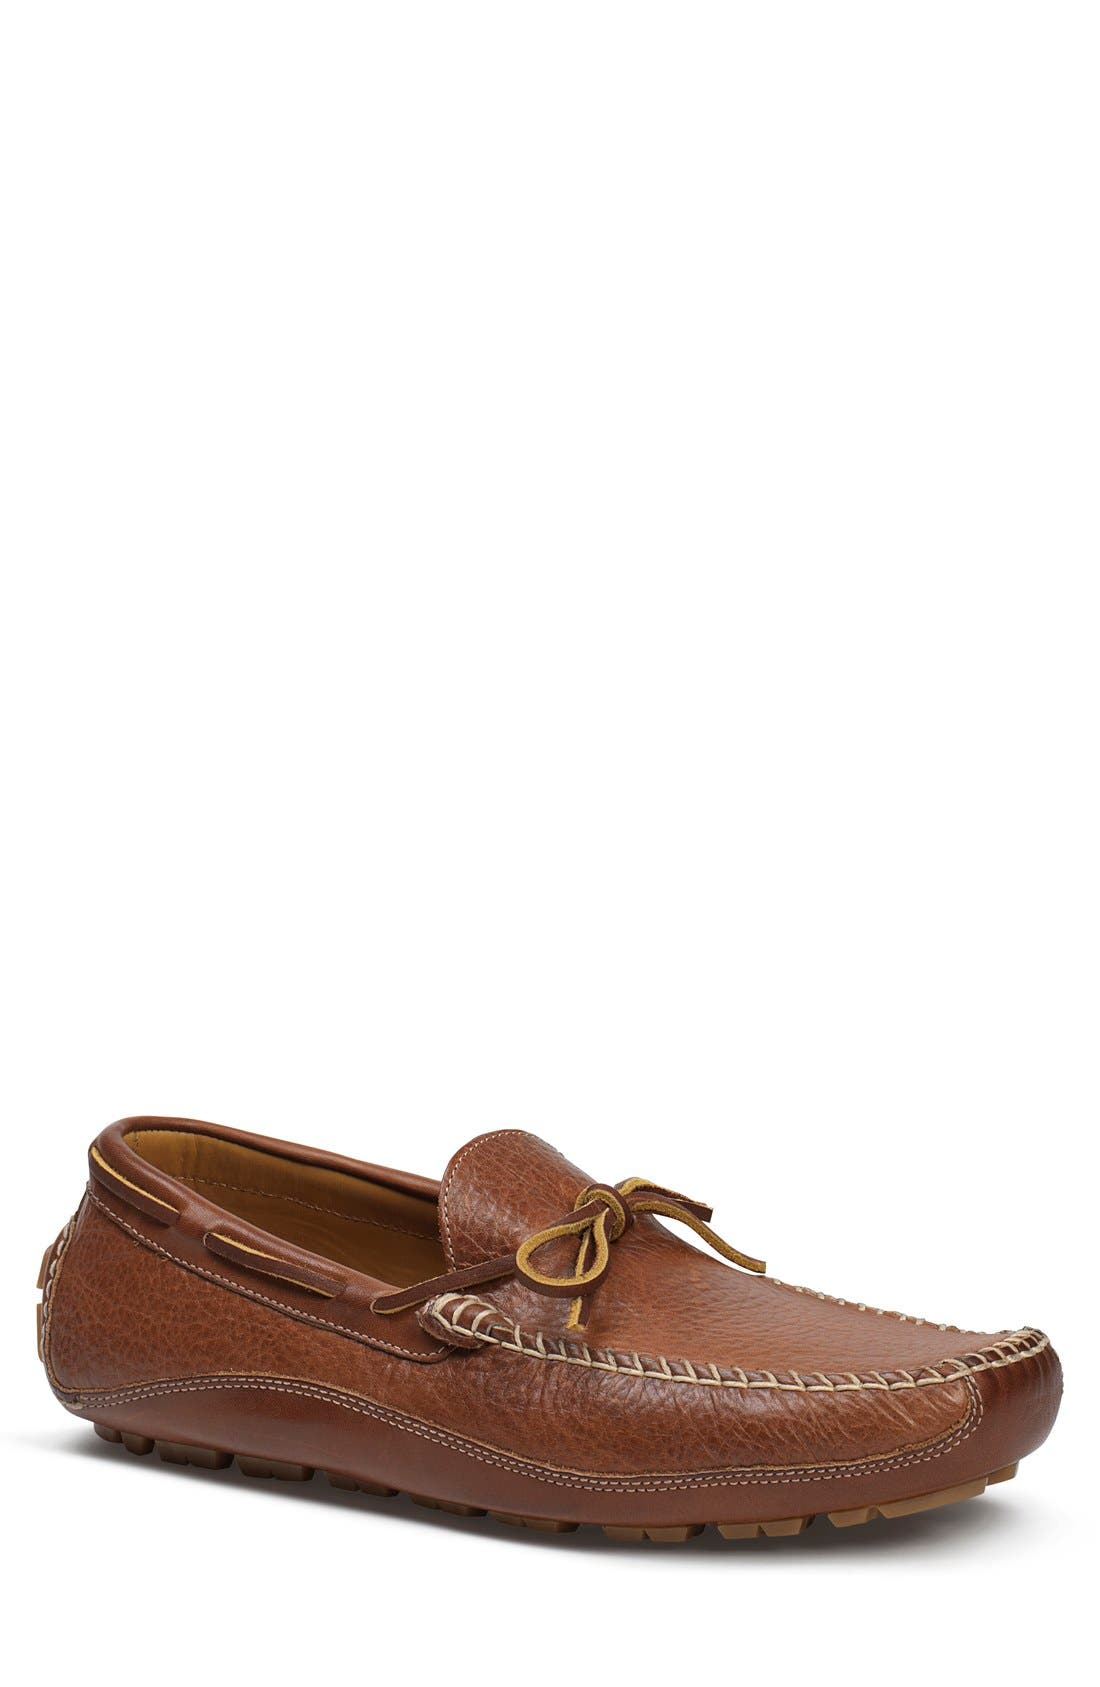 'Drake' Leather Driving Shoe,                         Main,                         color, SADDLE TAN